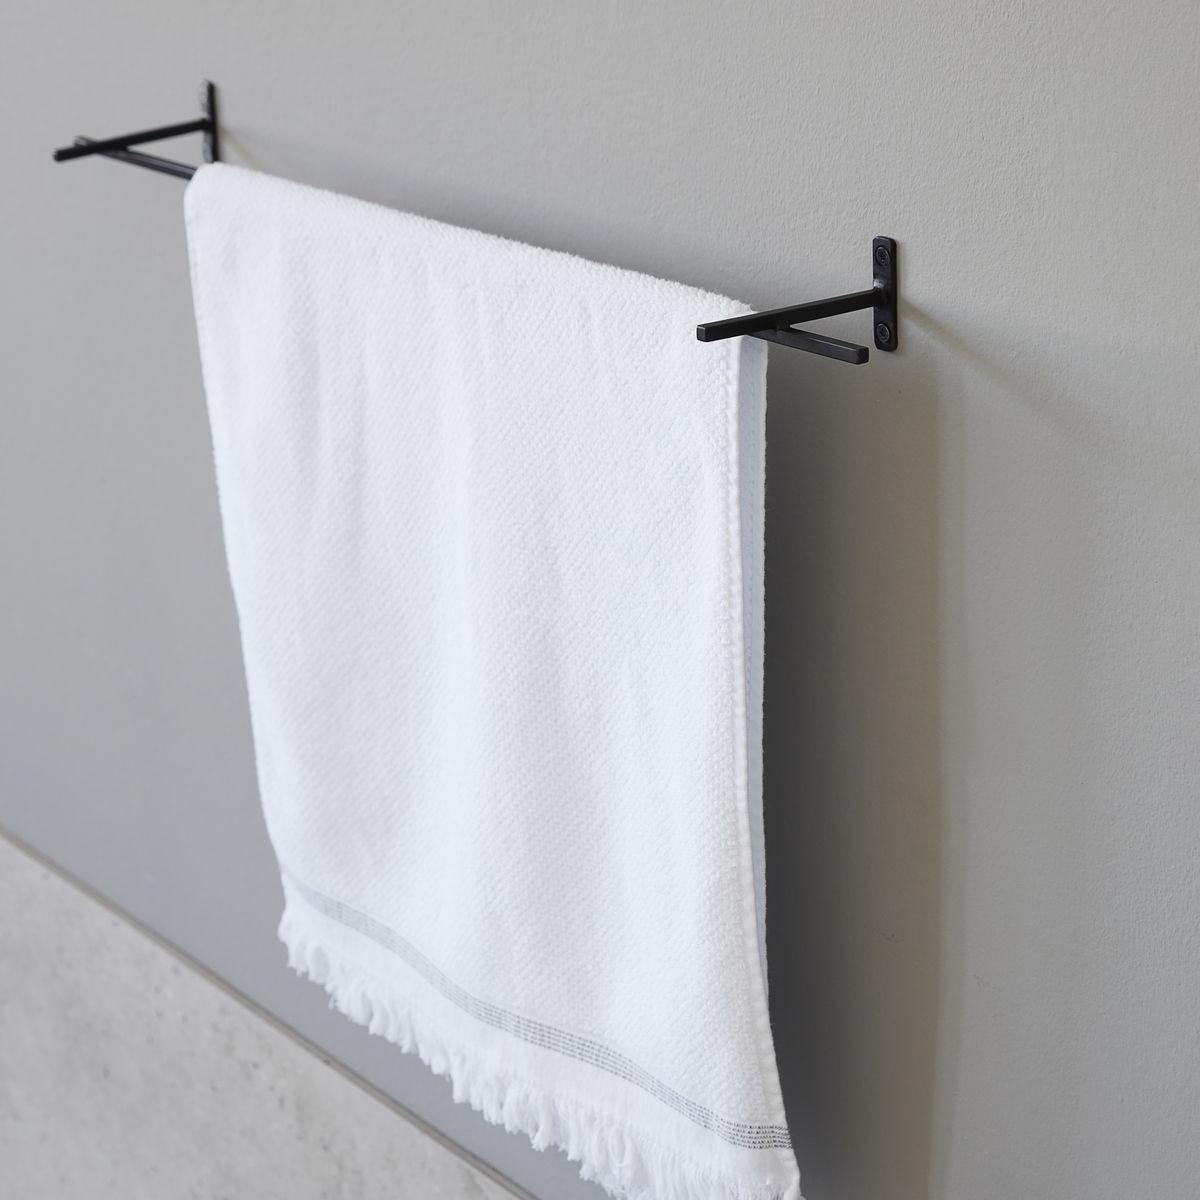 Regal / Handtuchhalter Add